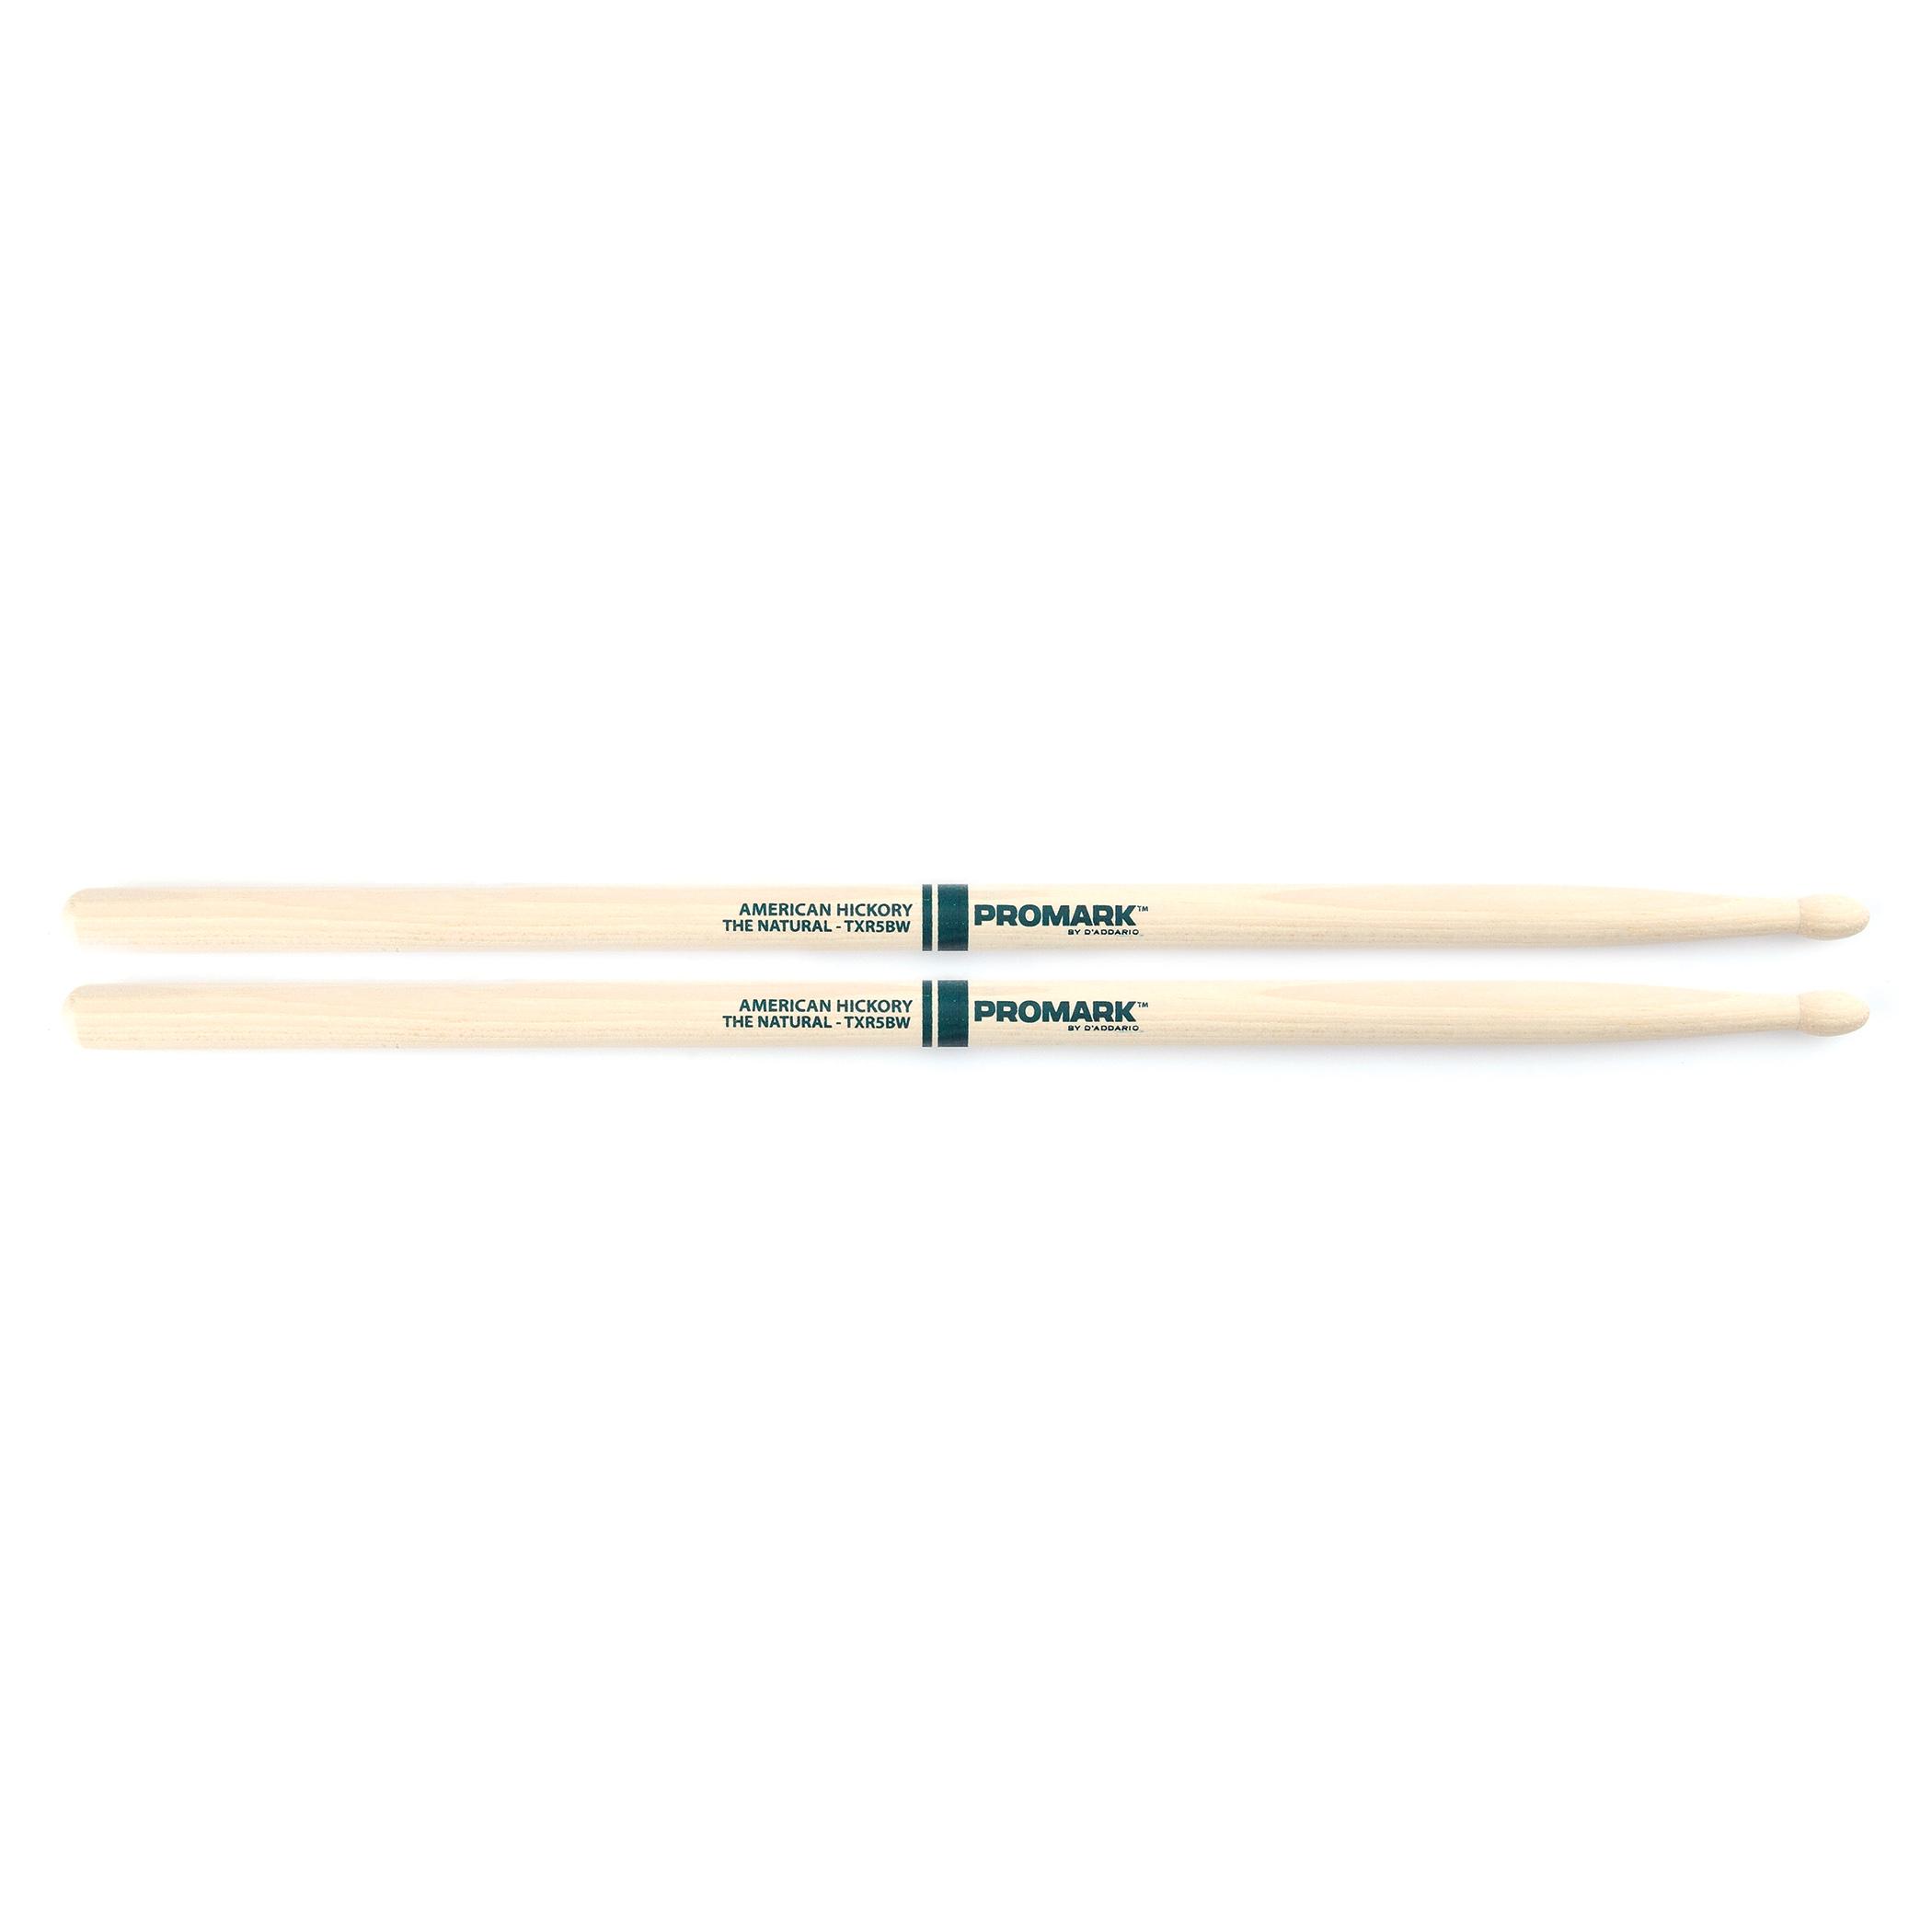 Promark Classic Natural 5B Wood Tip Drumsticks